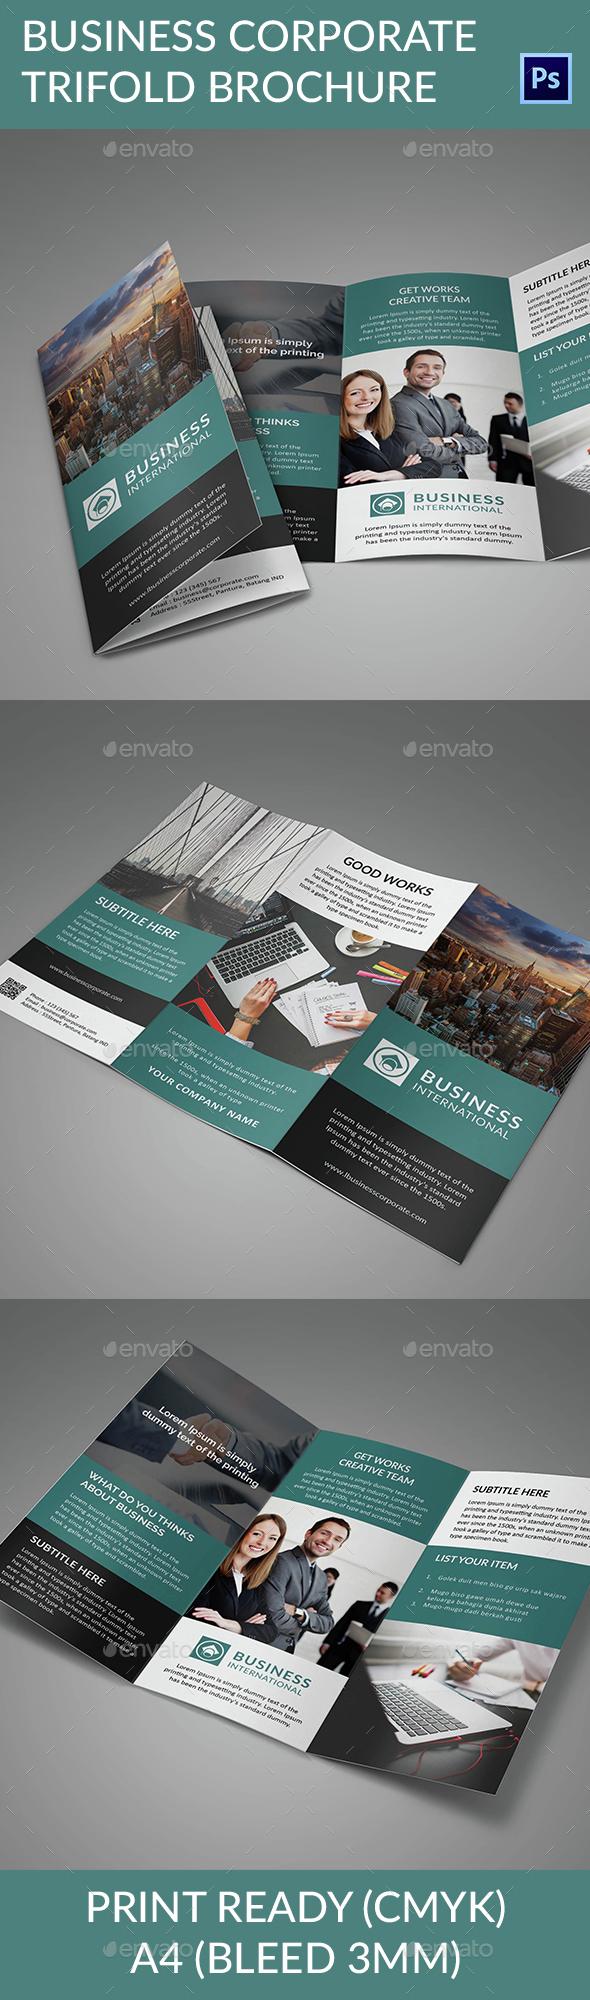 Business Corporate Trifold Brochure - Corporate Brochures